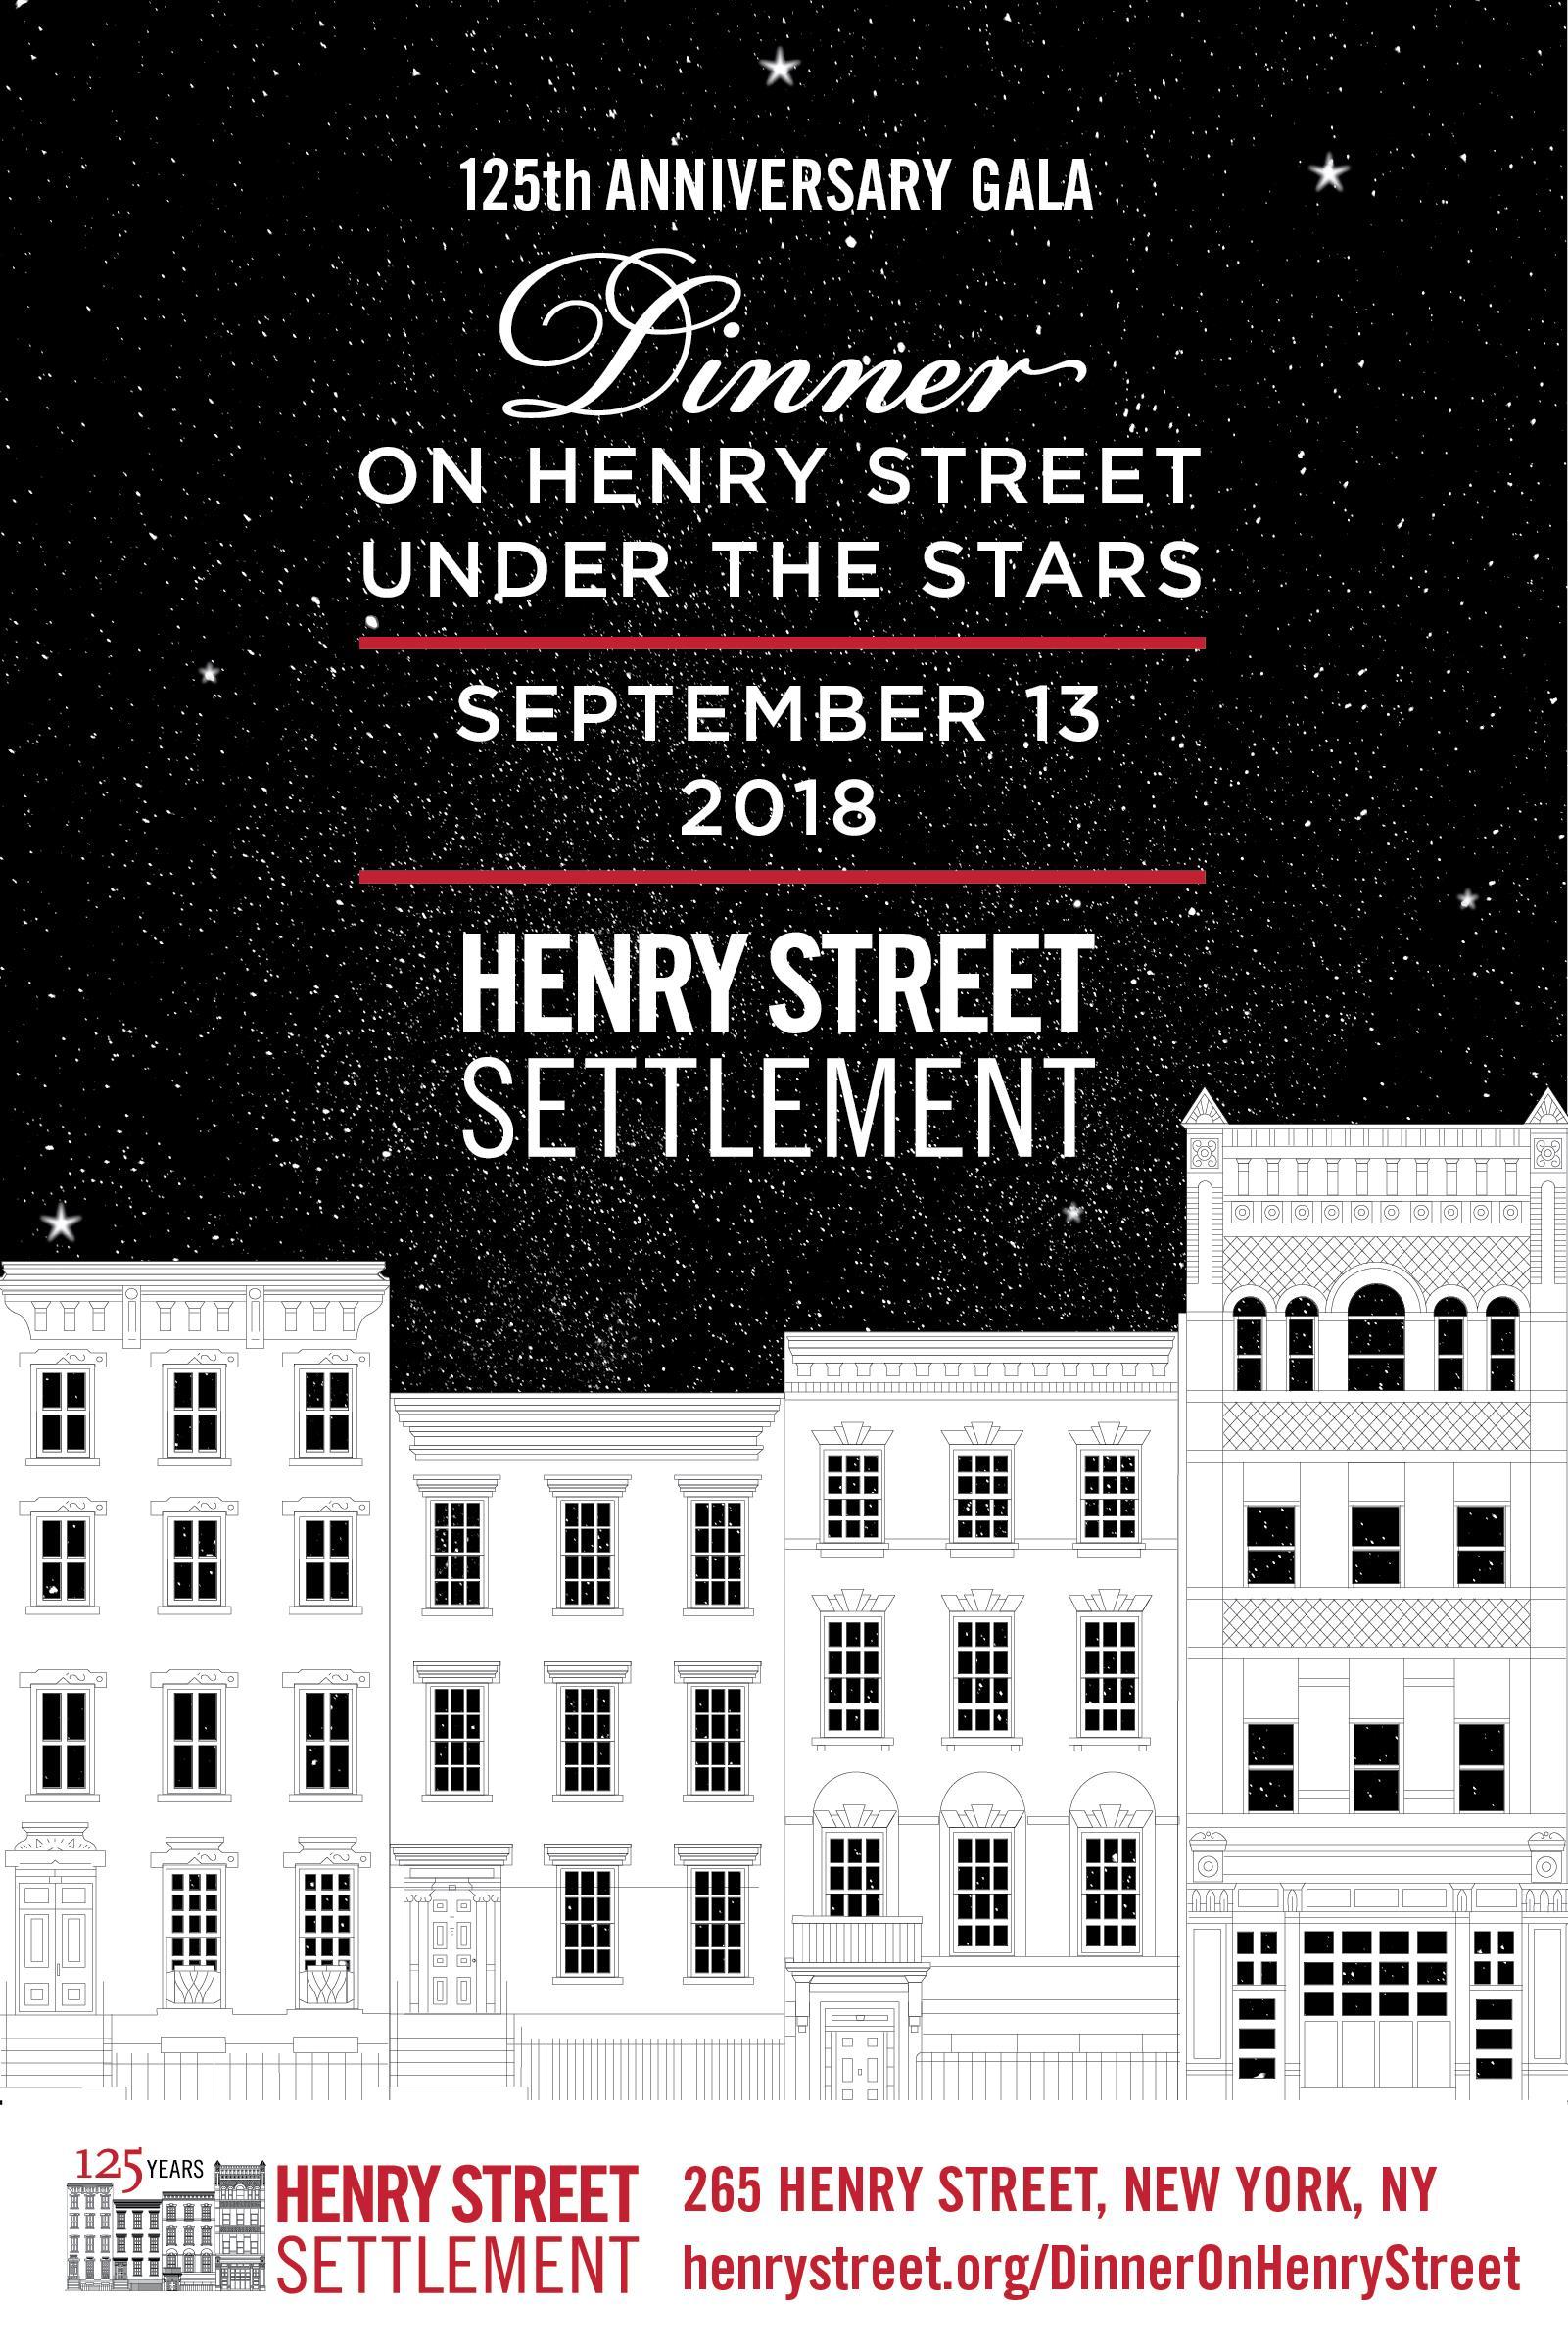 Henry Street Settlement 125th Anniversary Gala